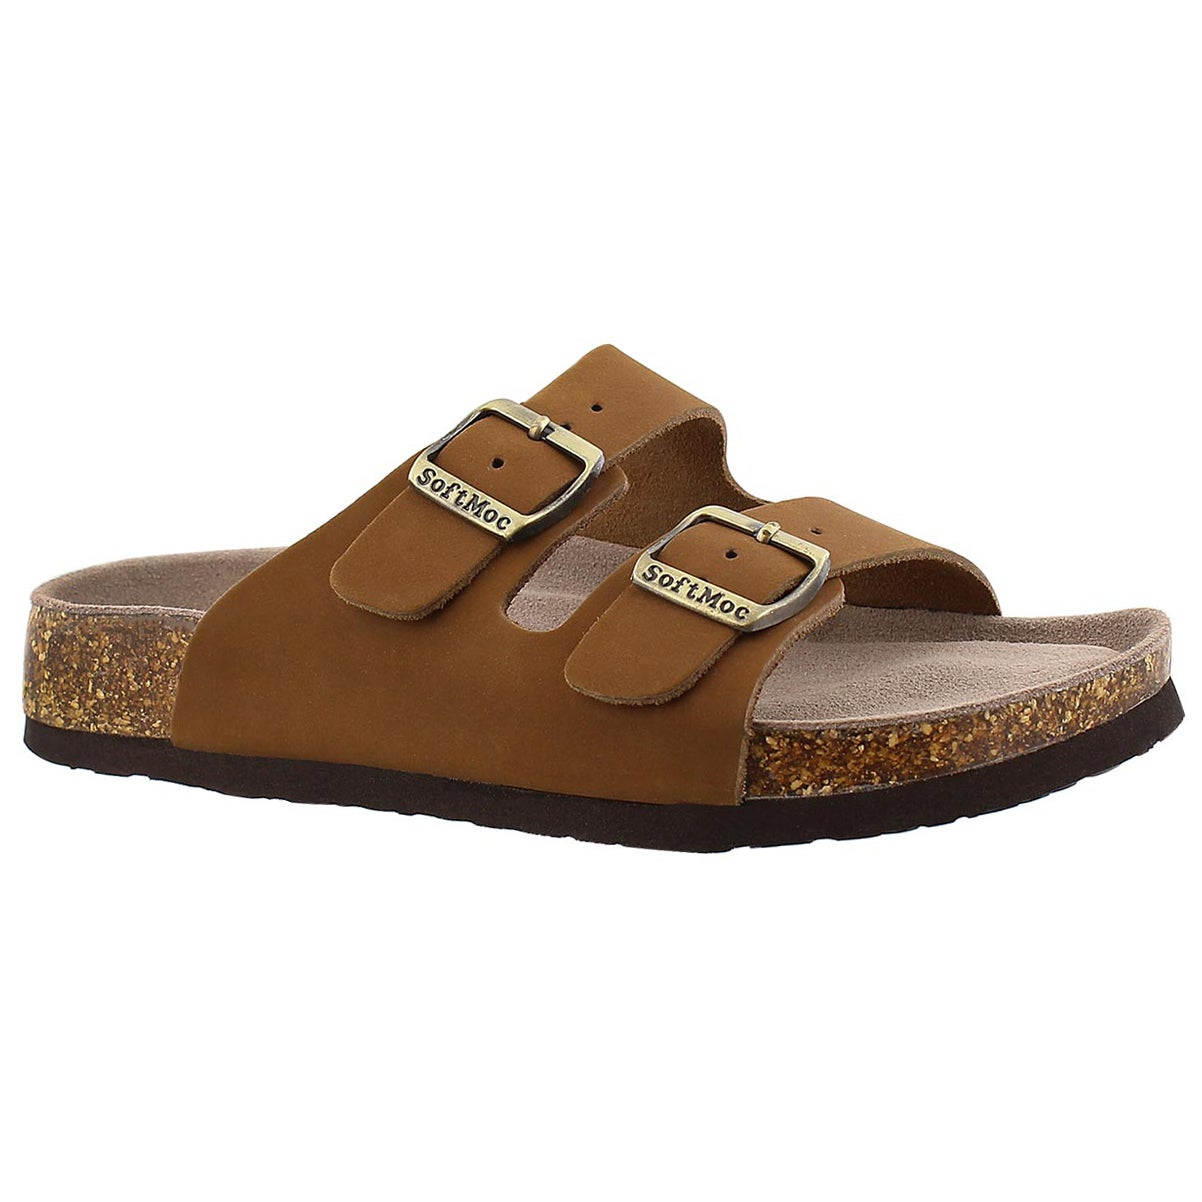 Lds Anna 3 tan crz memory footbed sandal